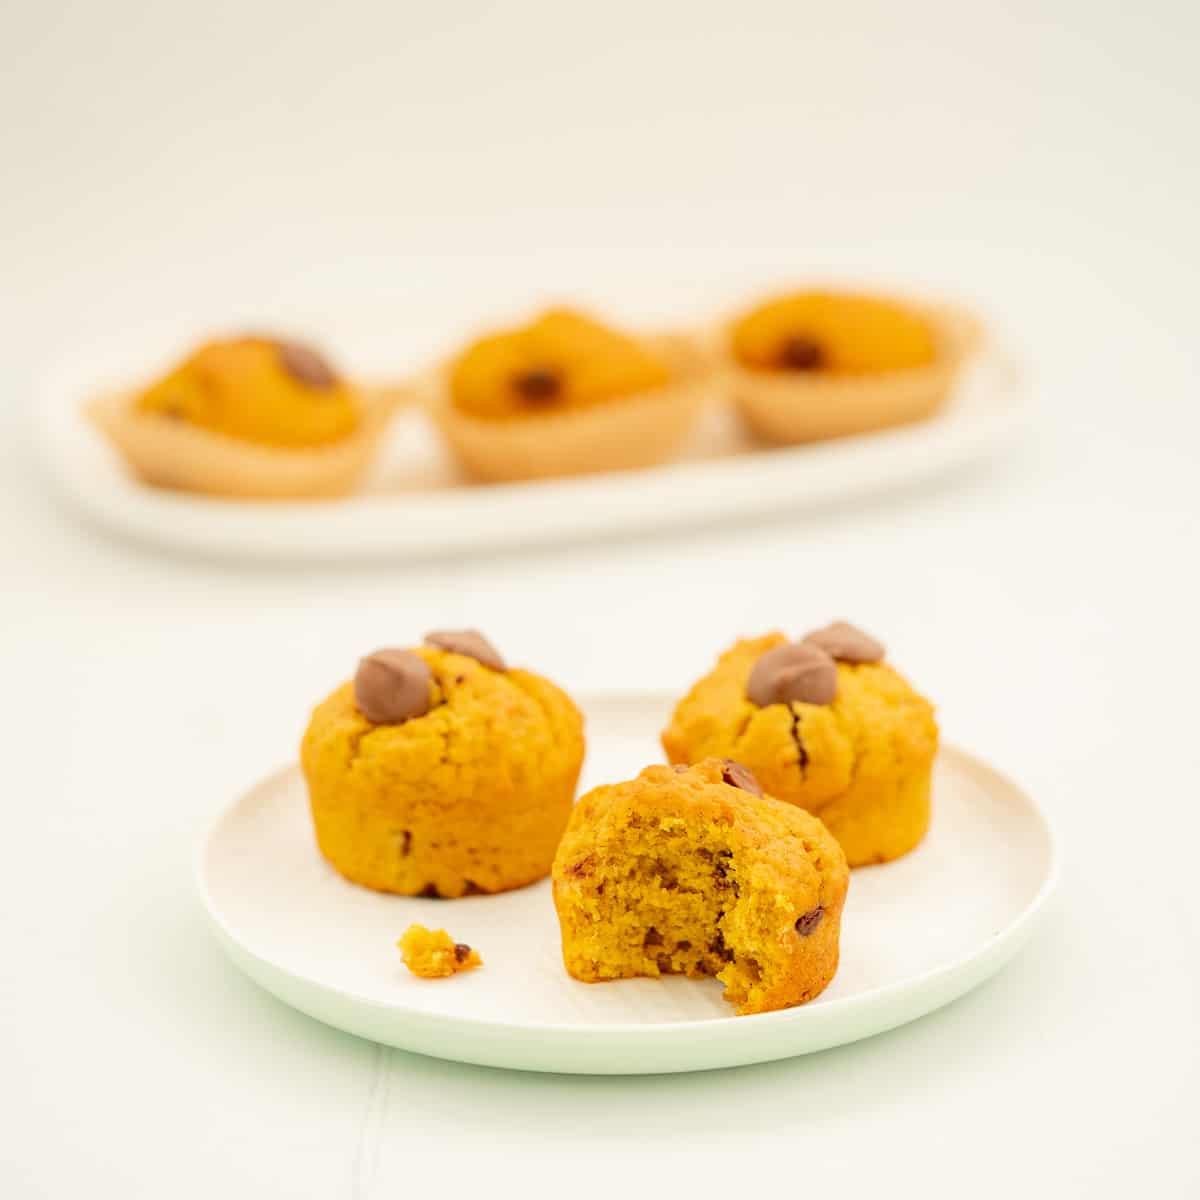 3 pumpkin chocolate chip muffins sitting on a white ceramic plate.